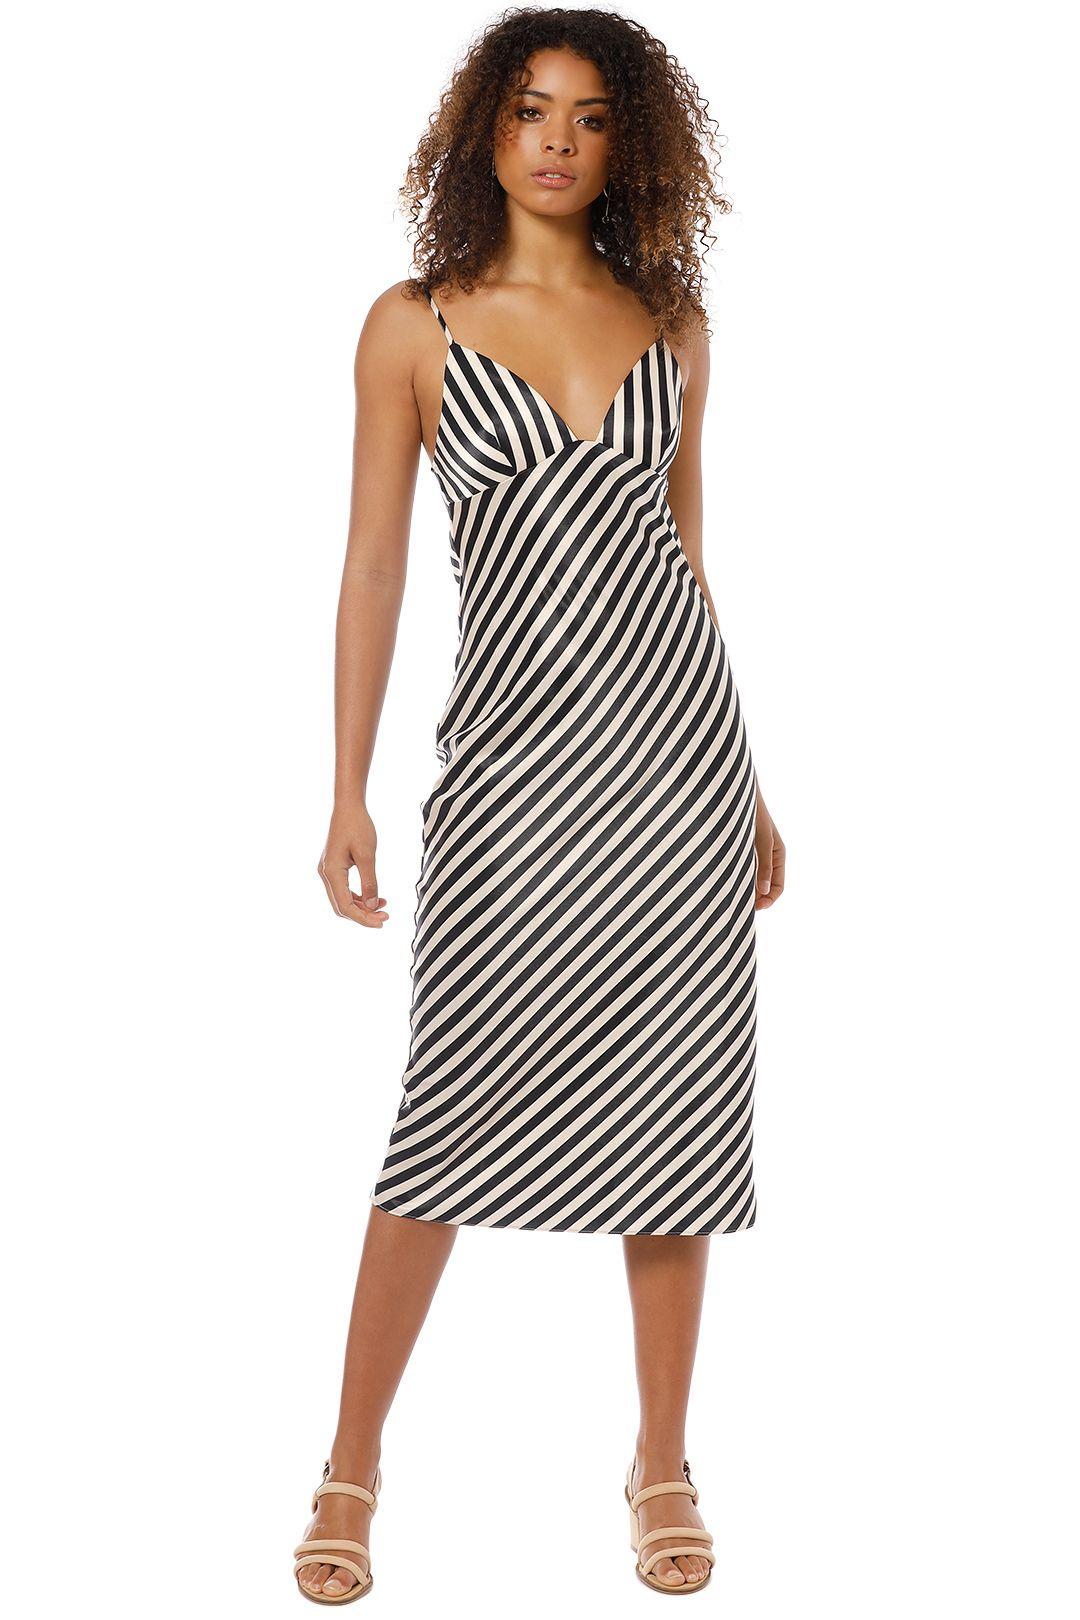 Shona Joy - Bias Slip Midi Dress - Stripe - Front